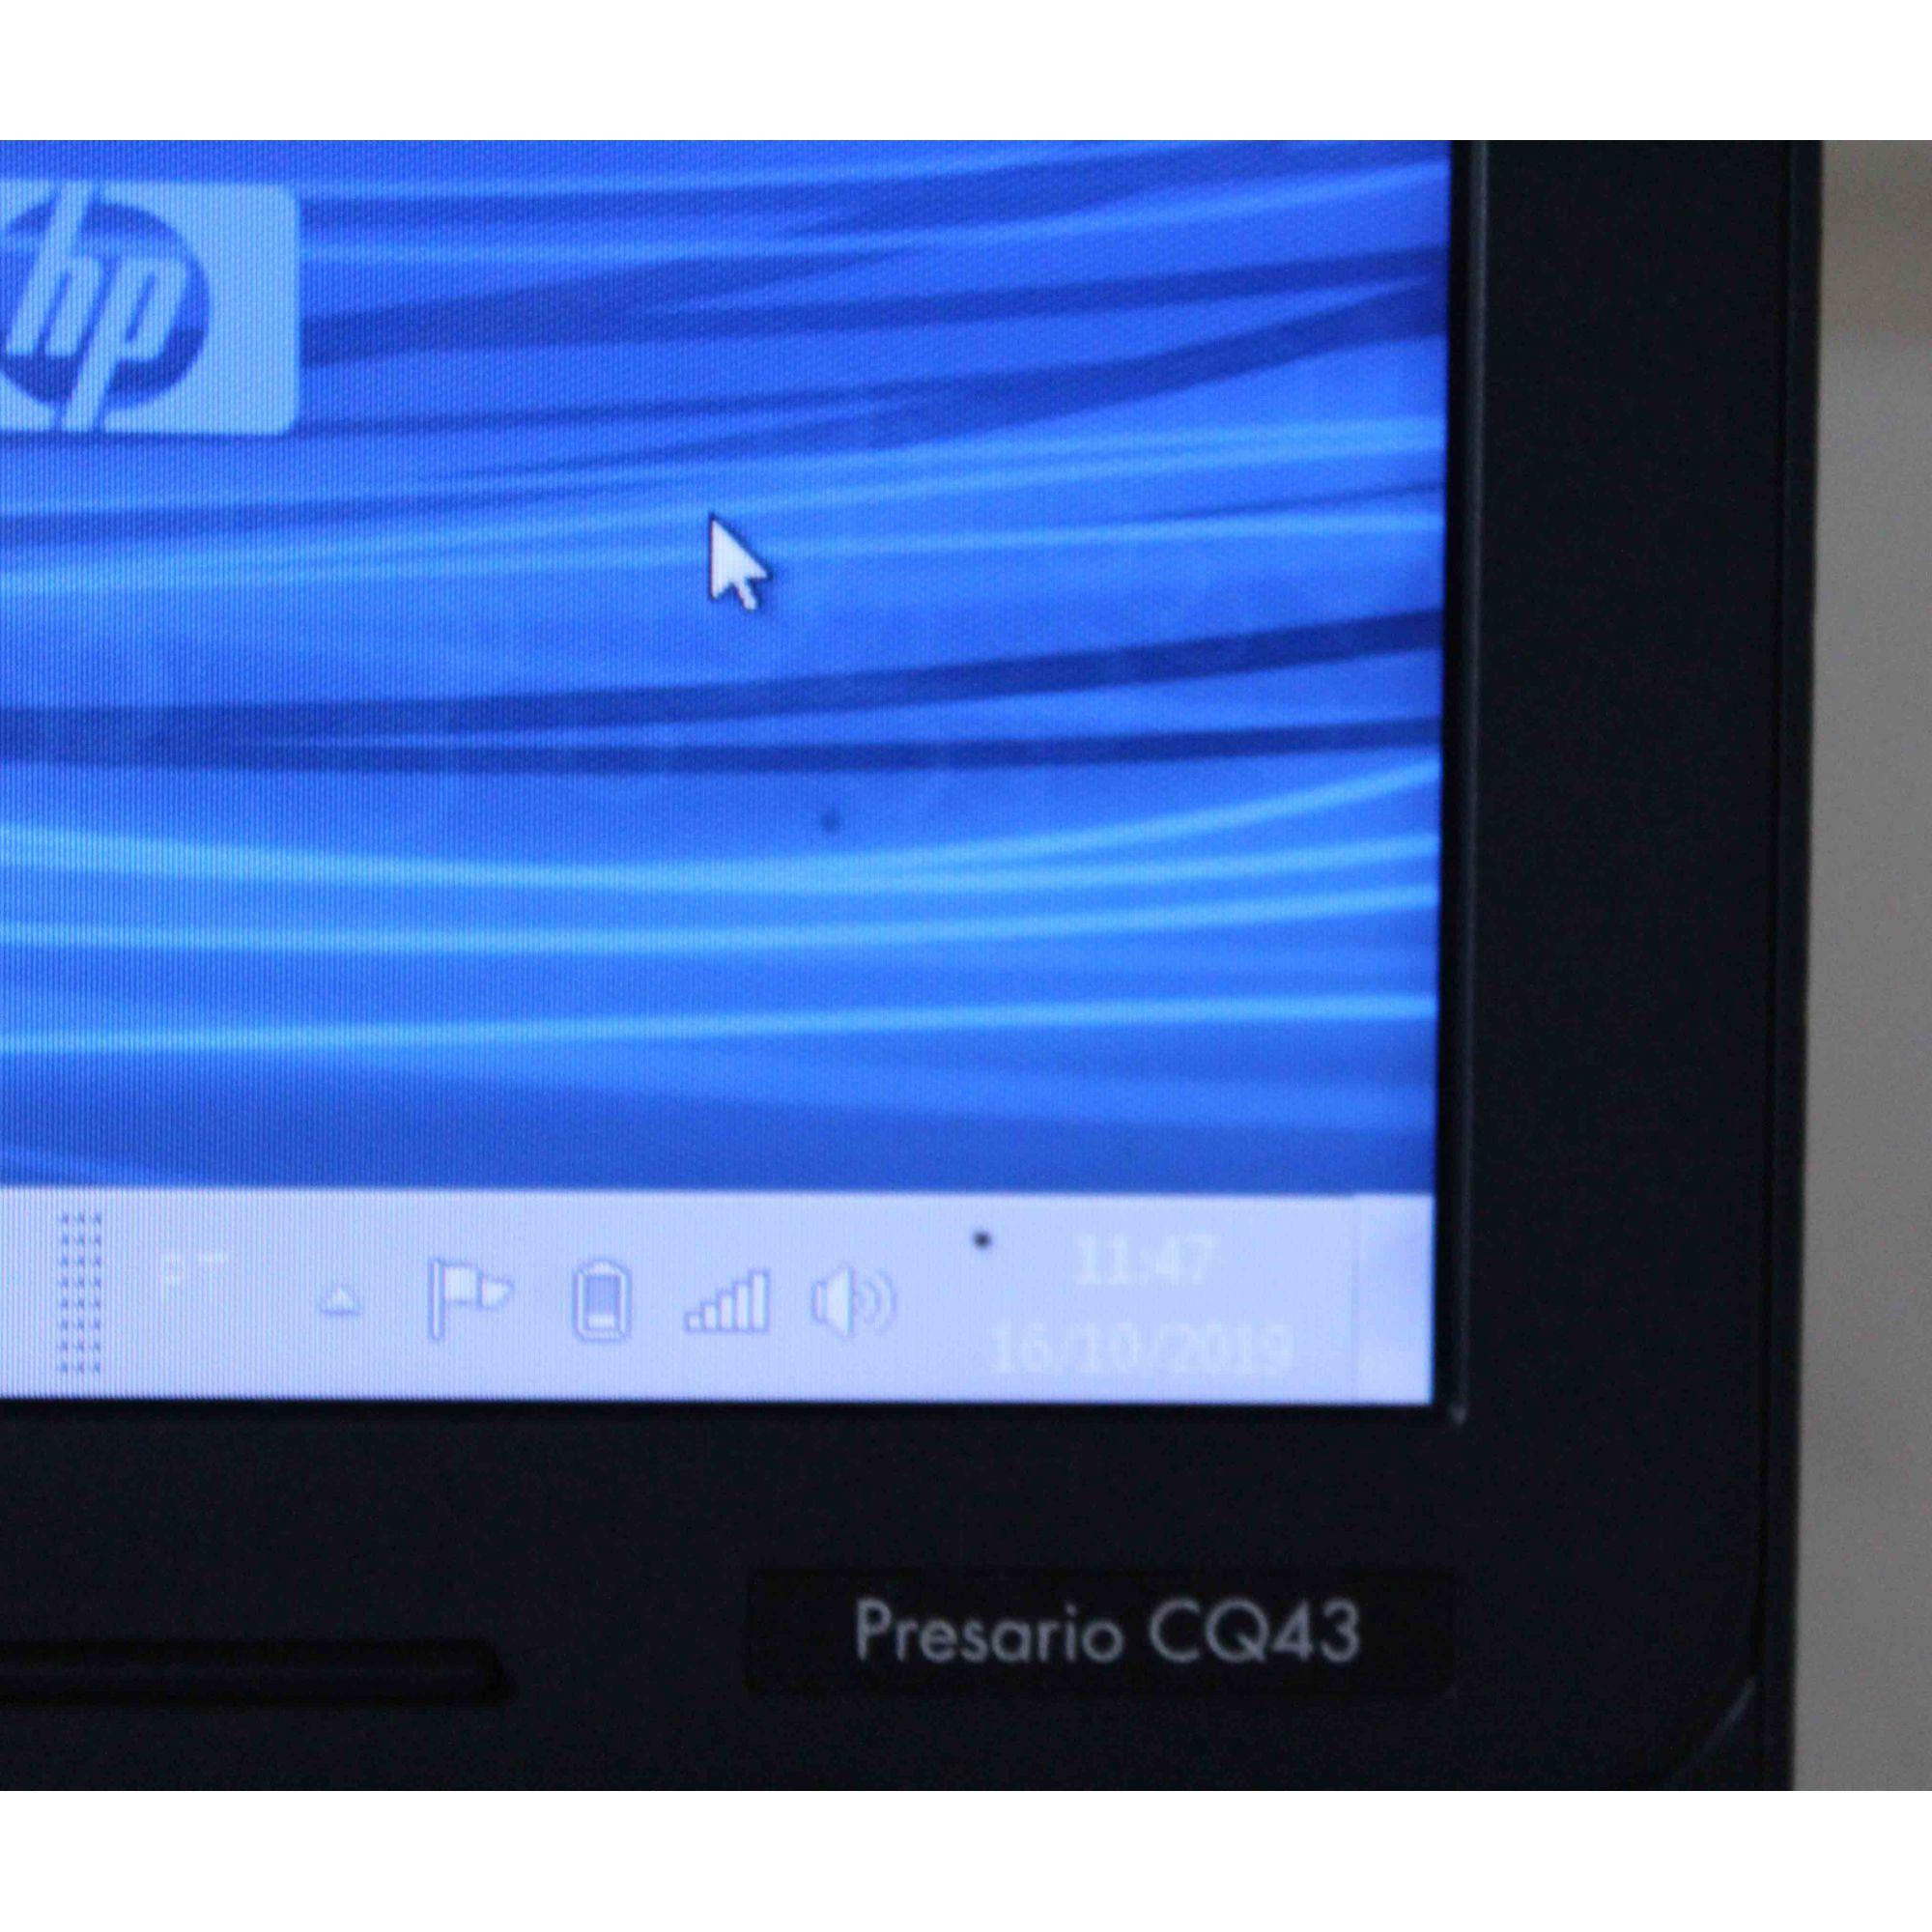 "Notebook HP Compaq Presario CQ43 14"" Intel Core i3 2.20GHz 4GB HD-640GB"